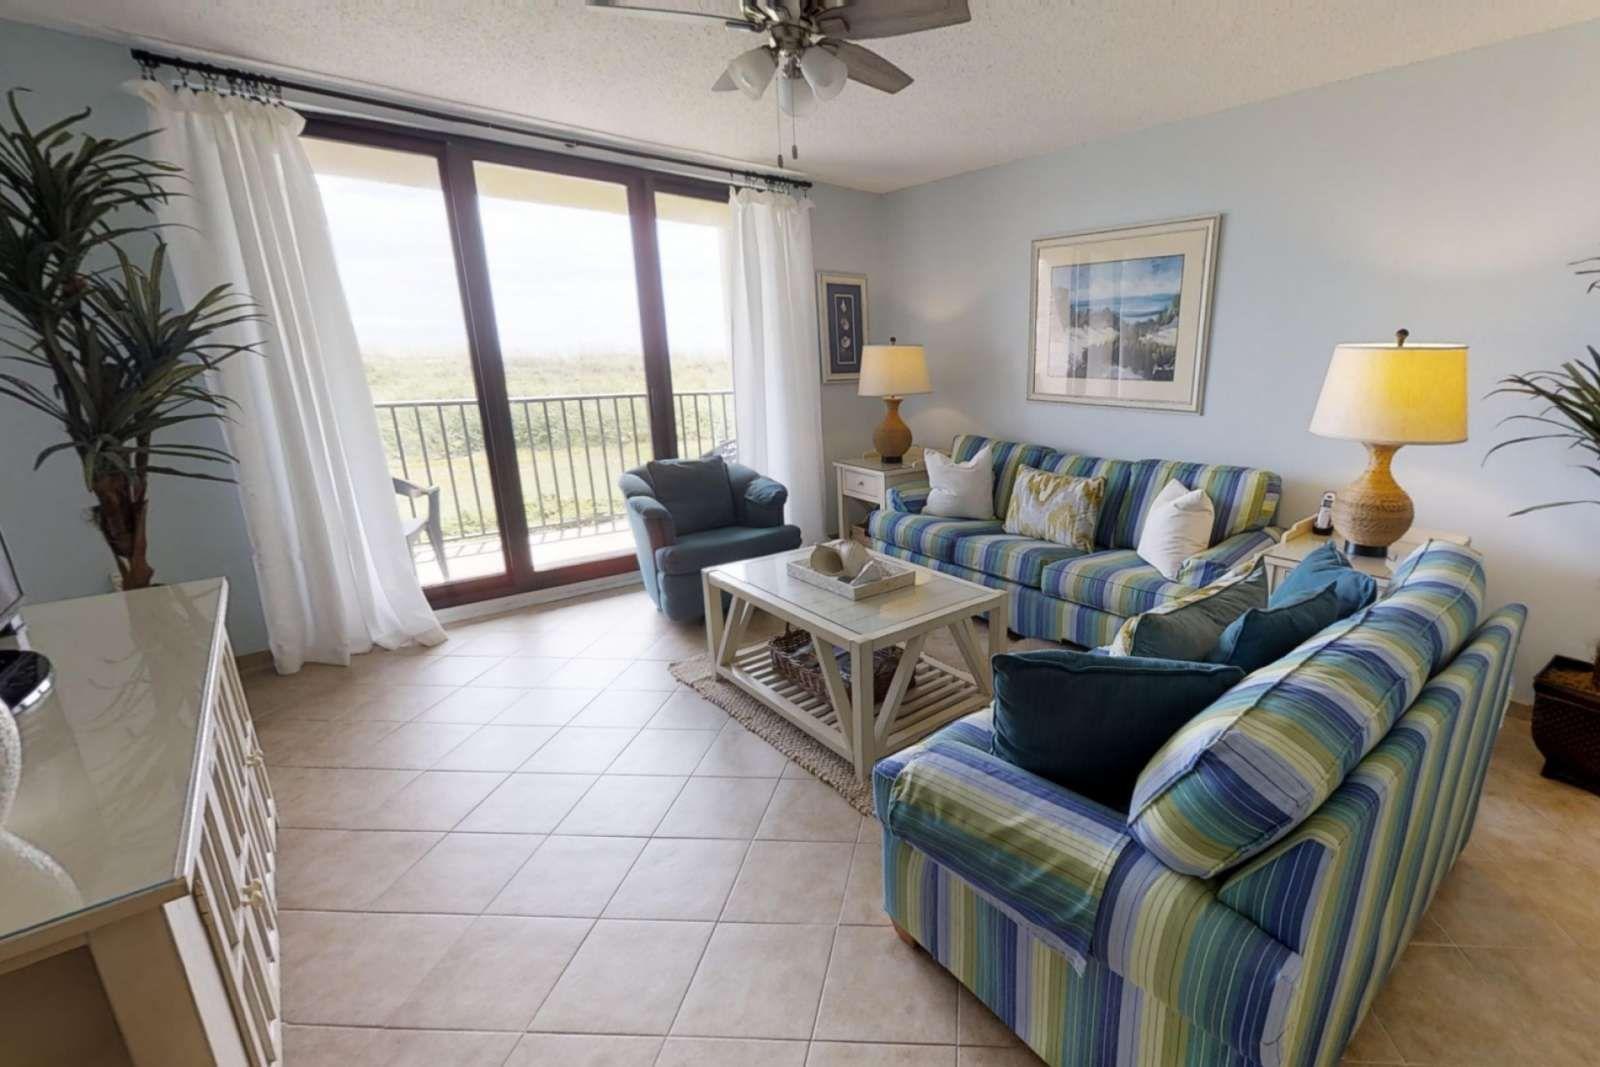 Park Art|My WordPress Blog_Hilton Head Resort Beach Chair Rentals